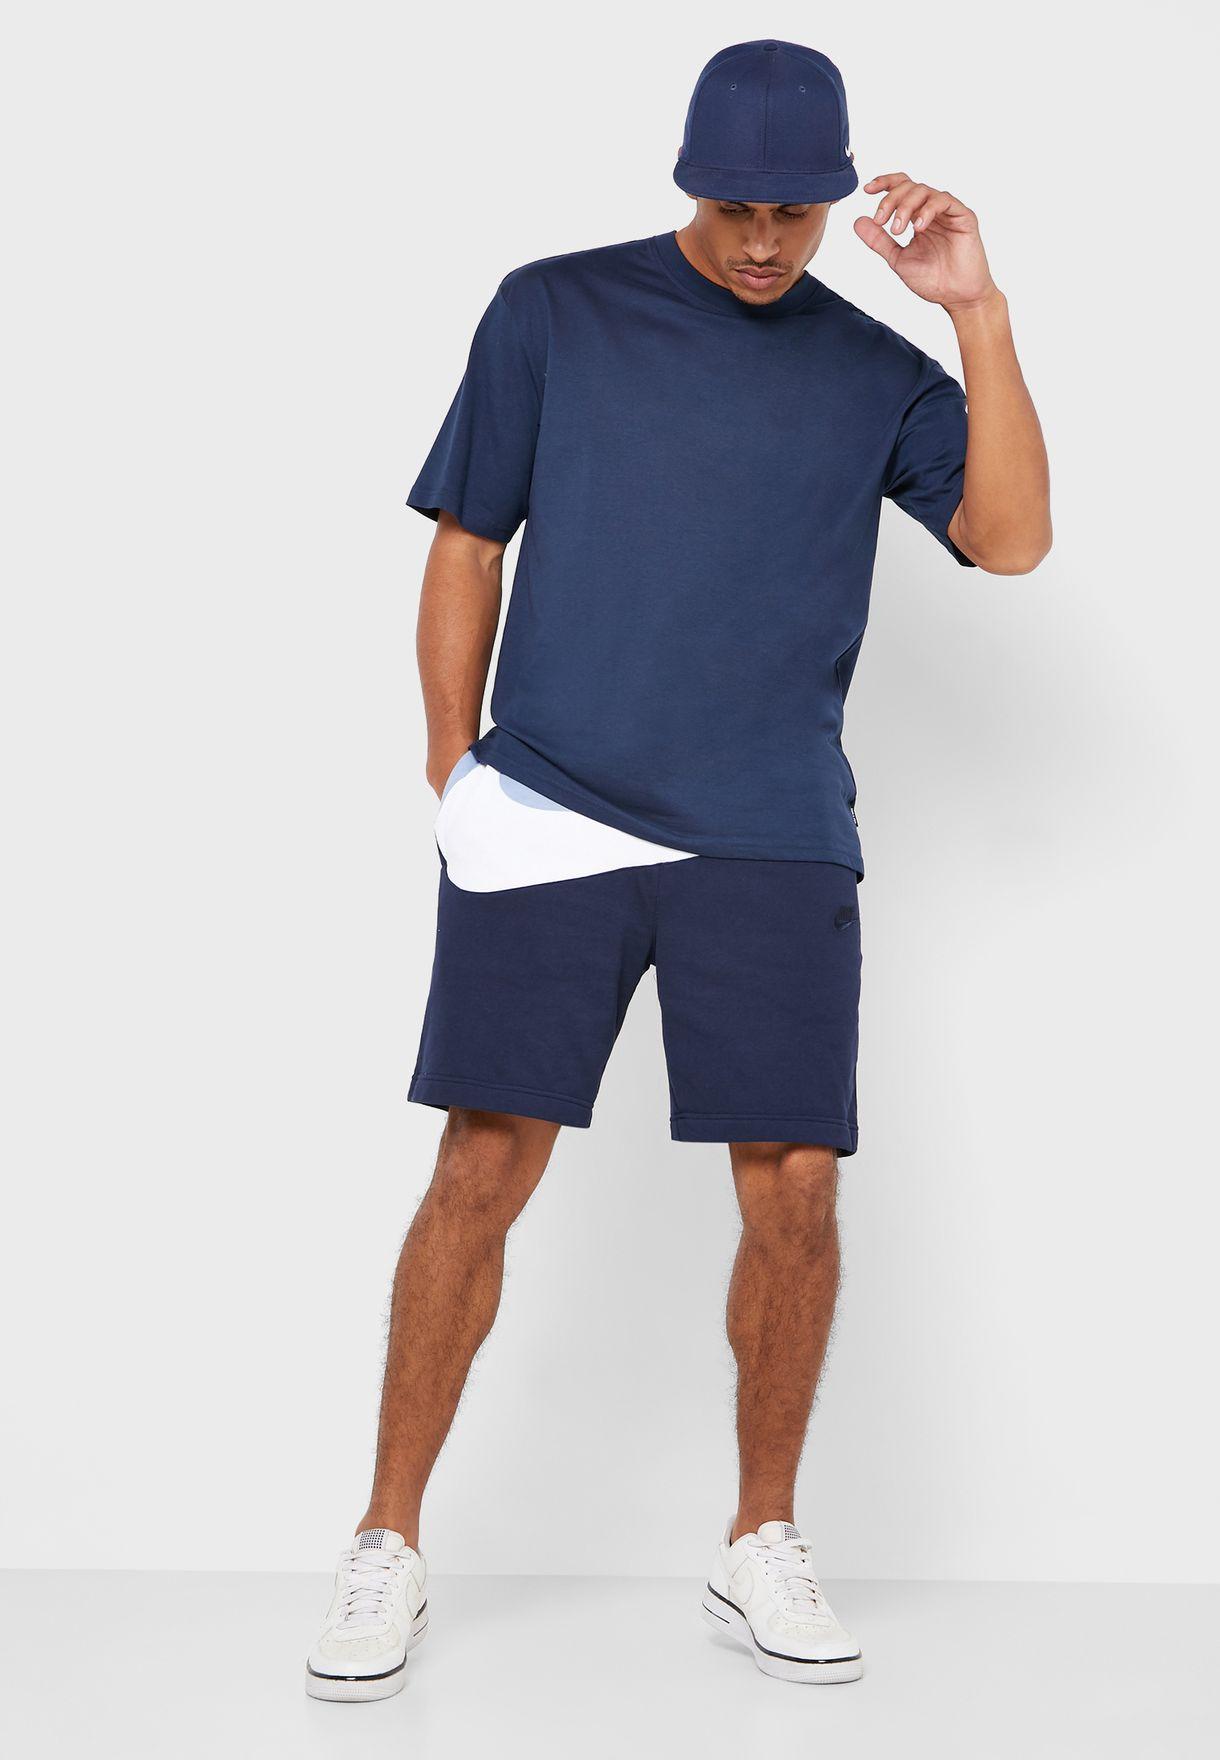 NSW Statement Shorts